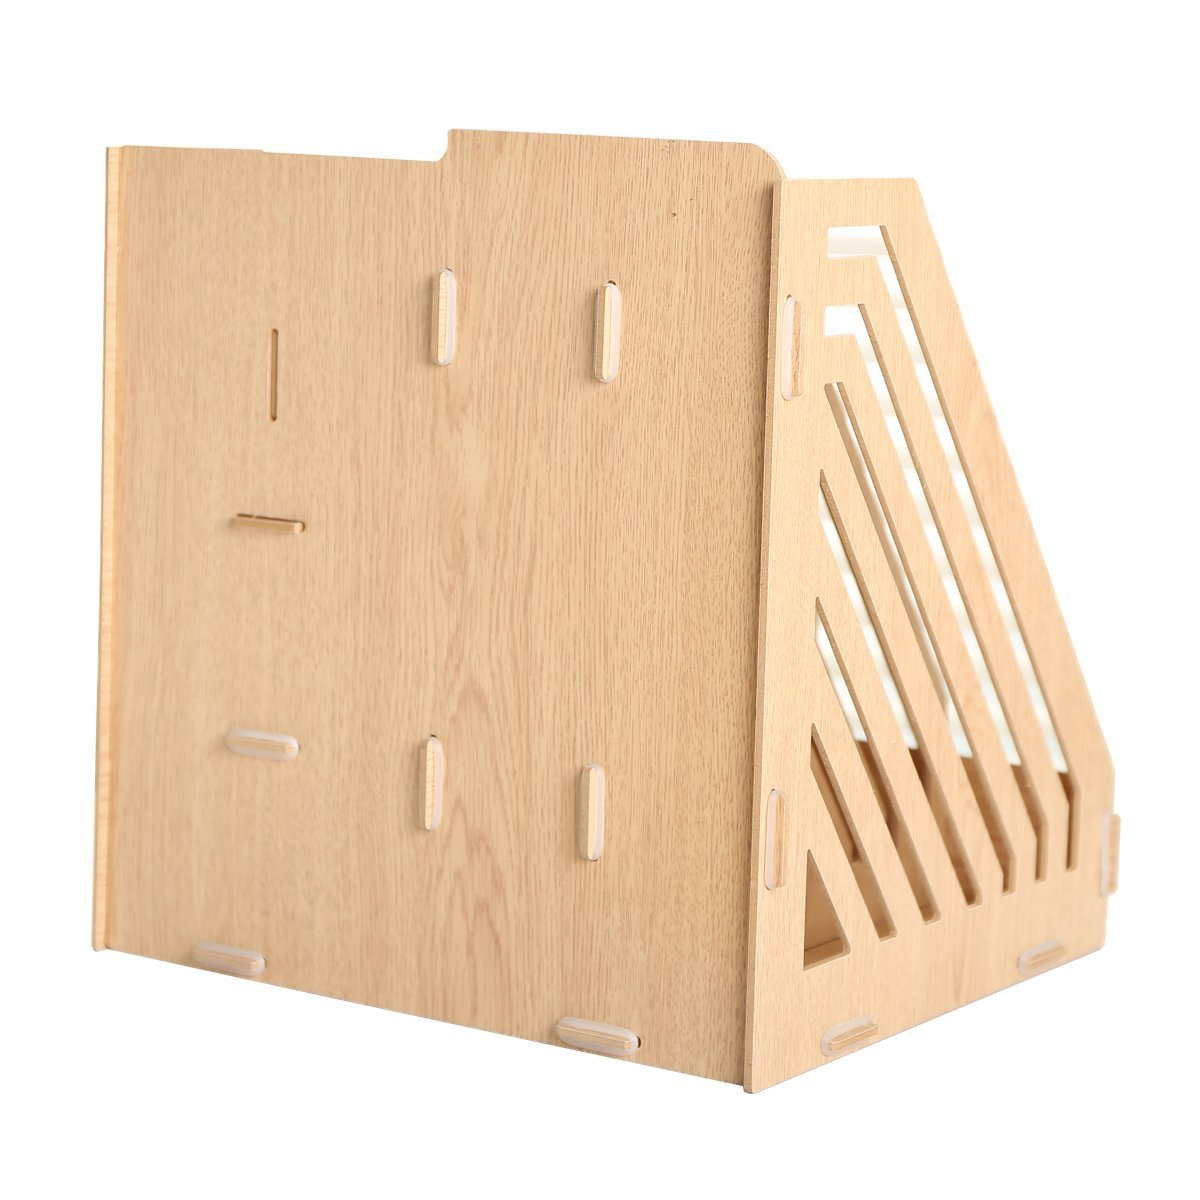 Hensych® Detachable Desktop Storage Box Wooden Board DIY Organizer ...